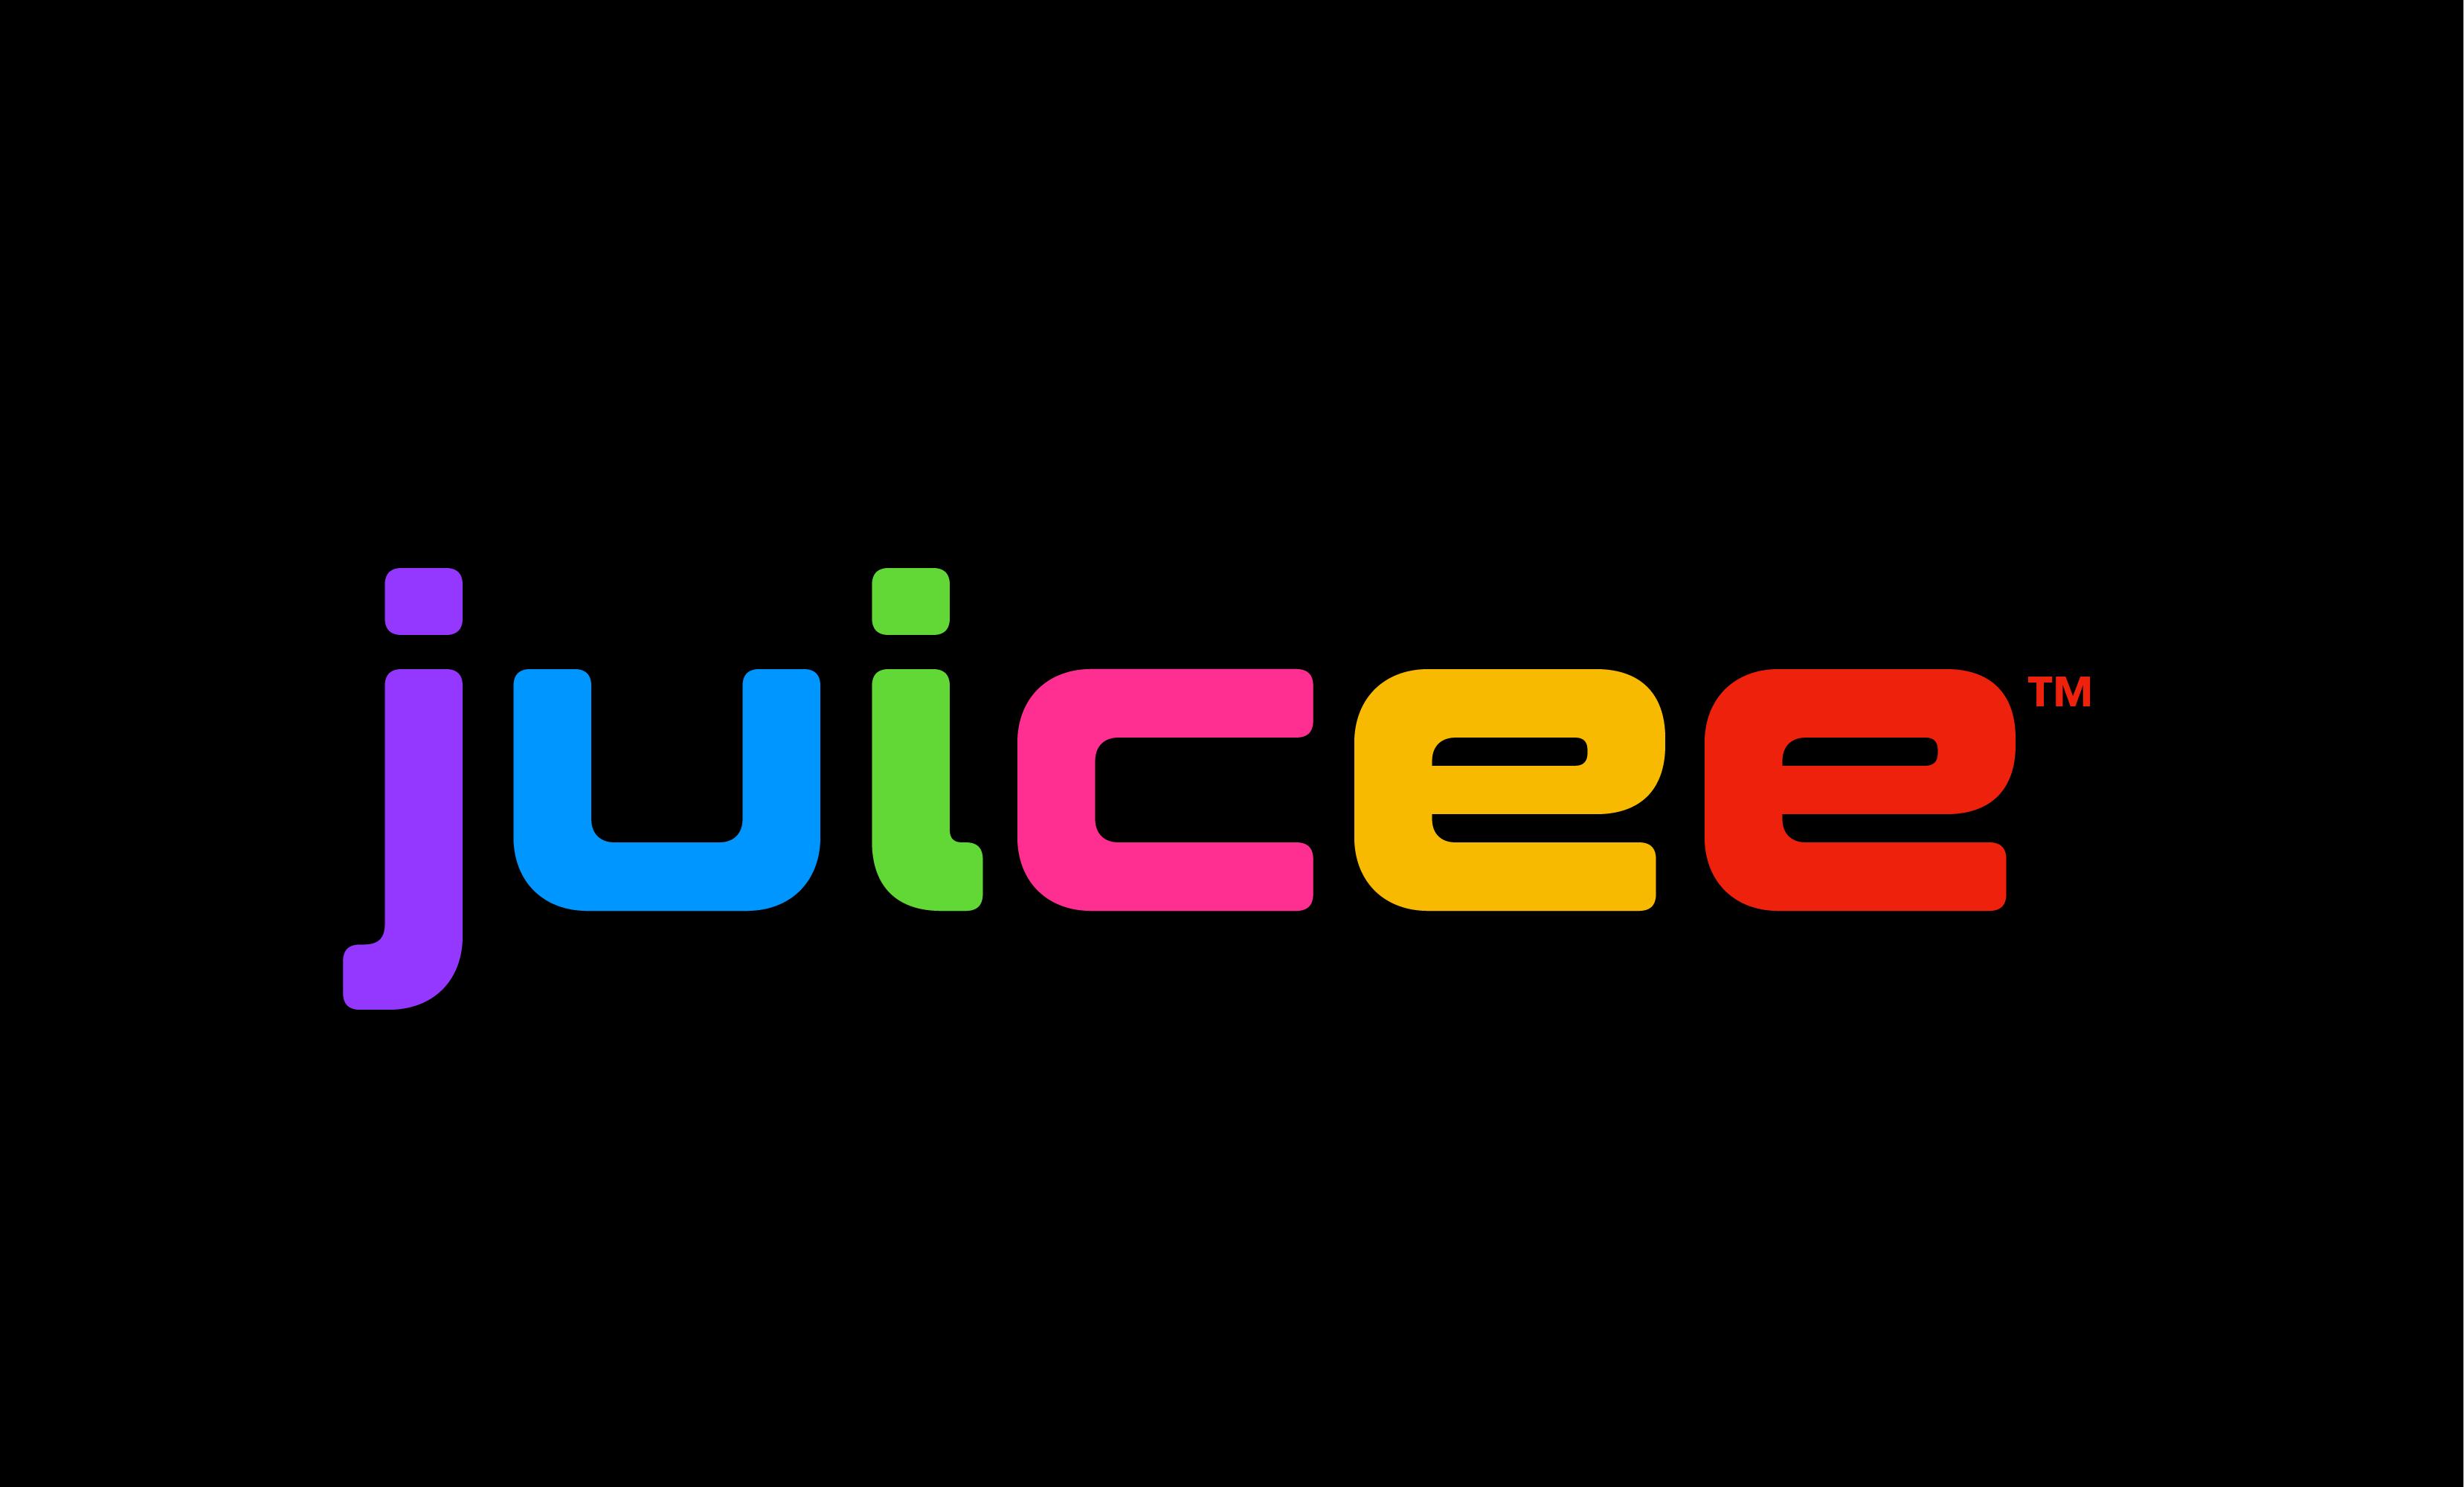 Juicee_Logo_W2